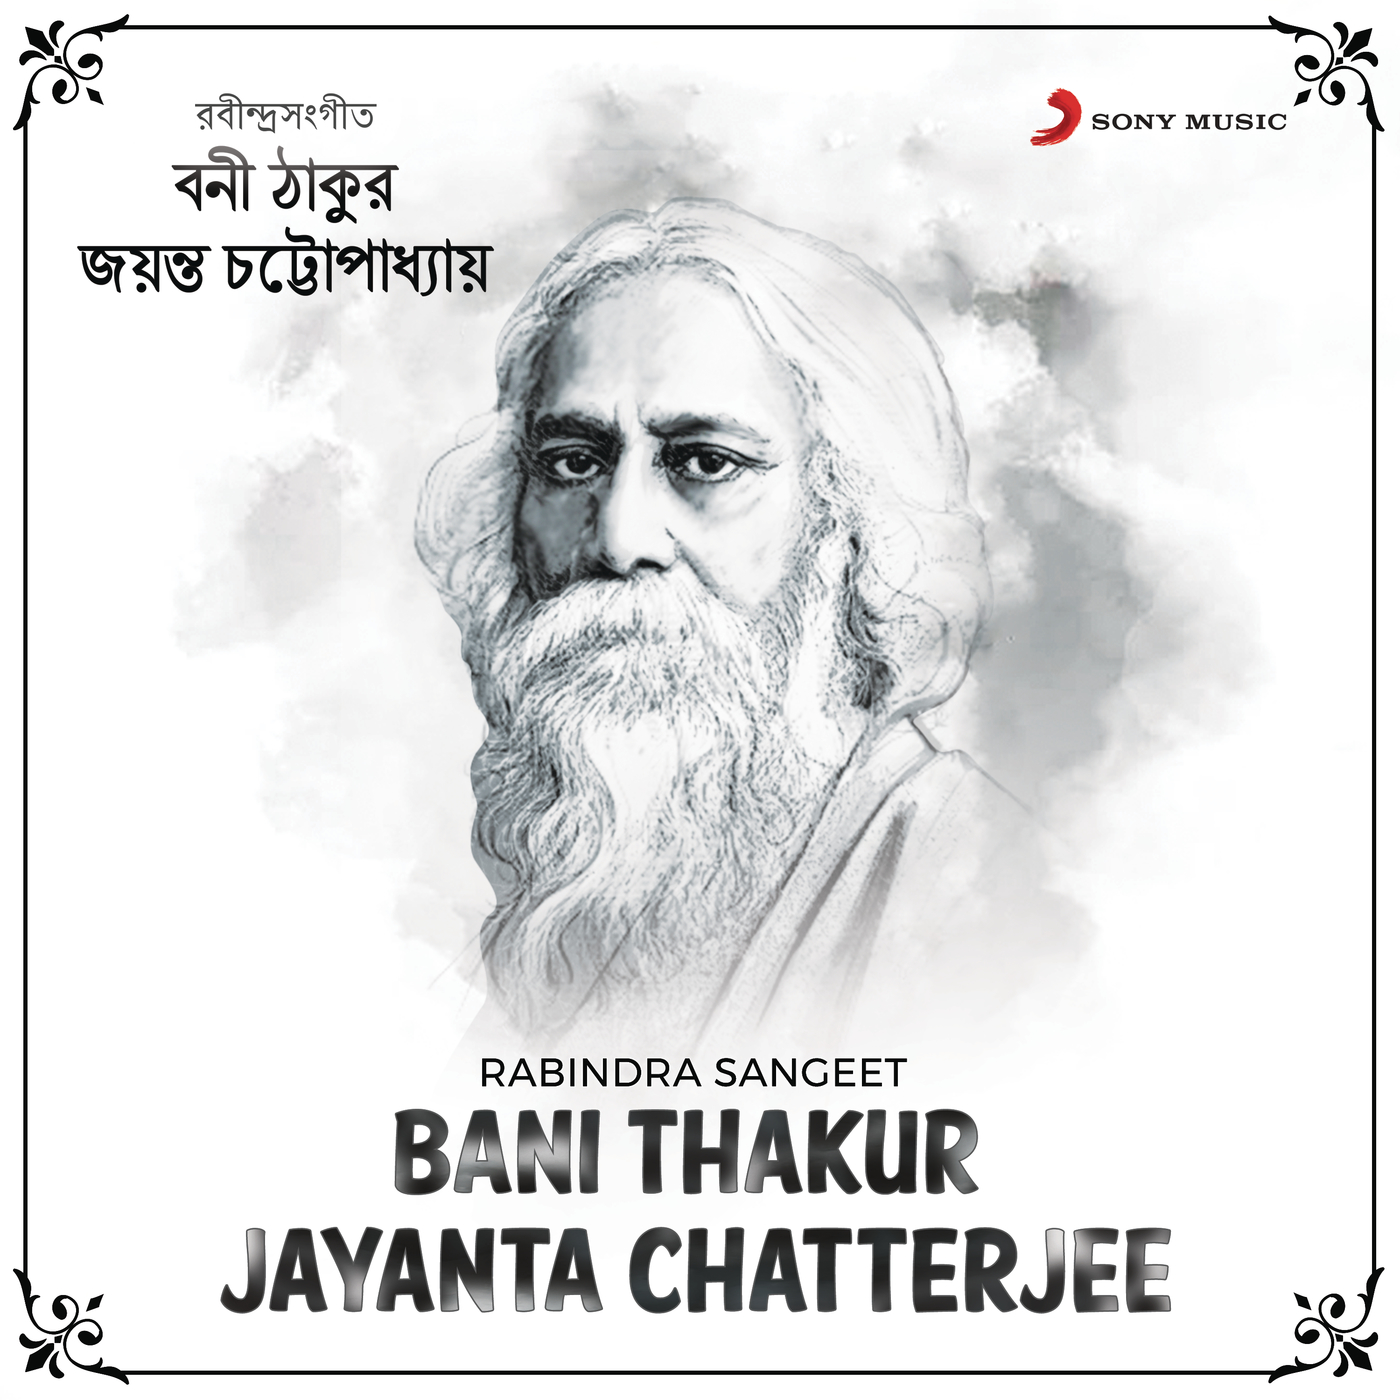 Rabindra Sangeet - Bani Thakur